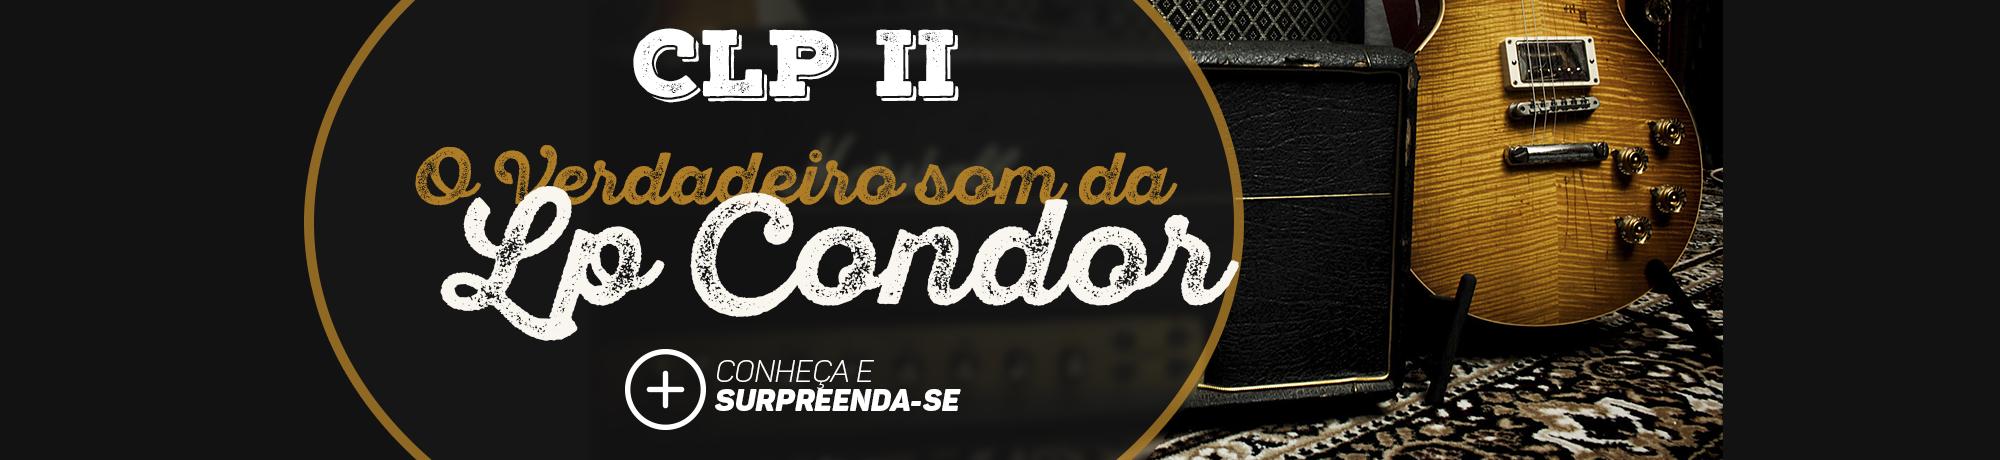 lp-condor